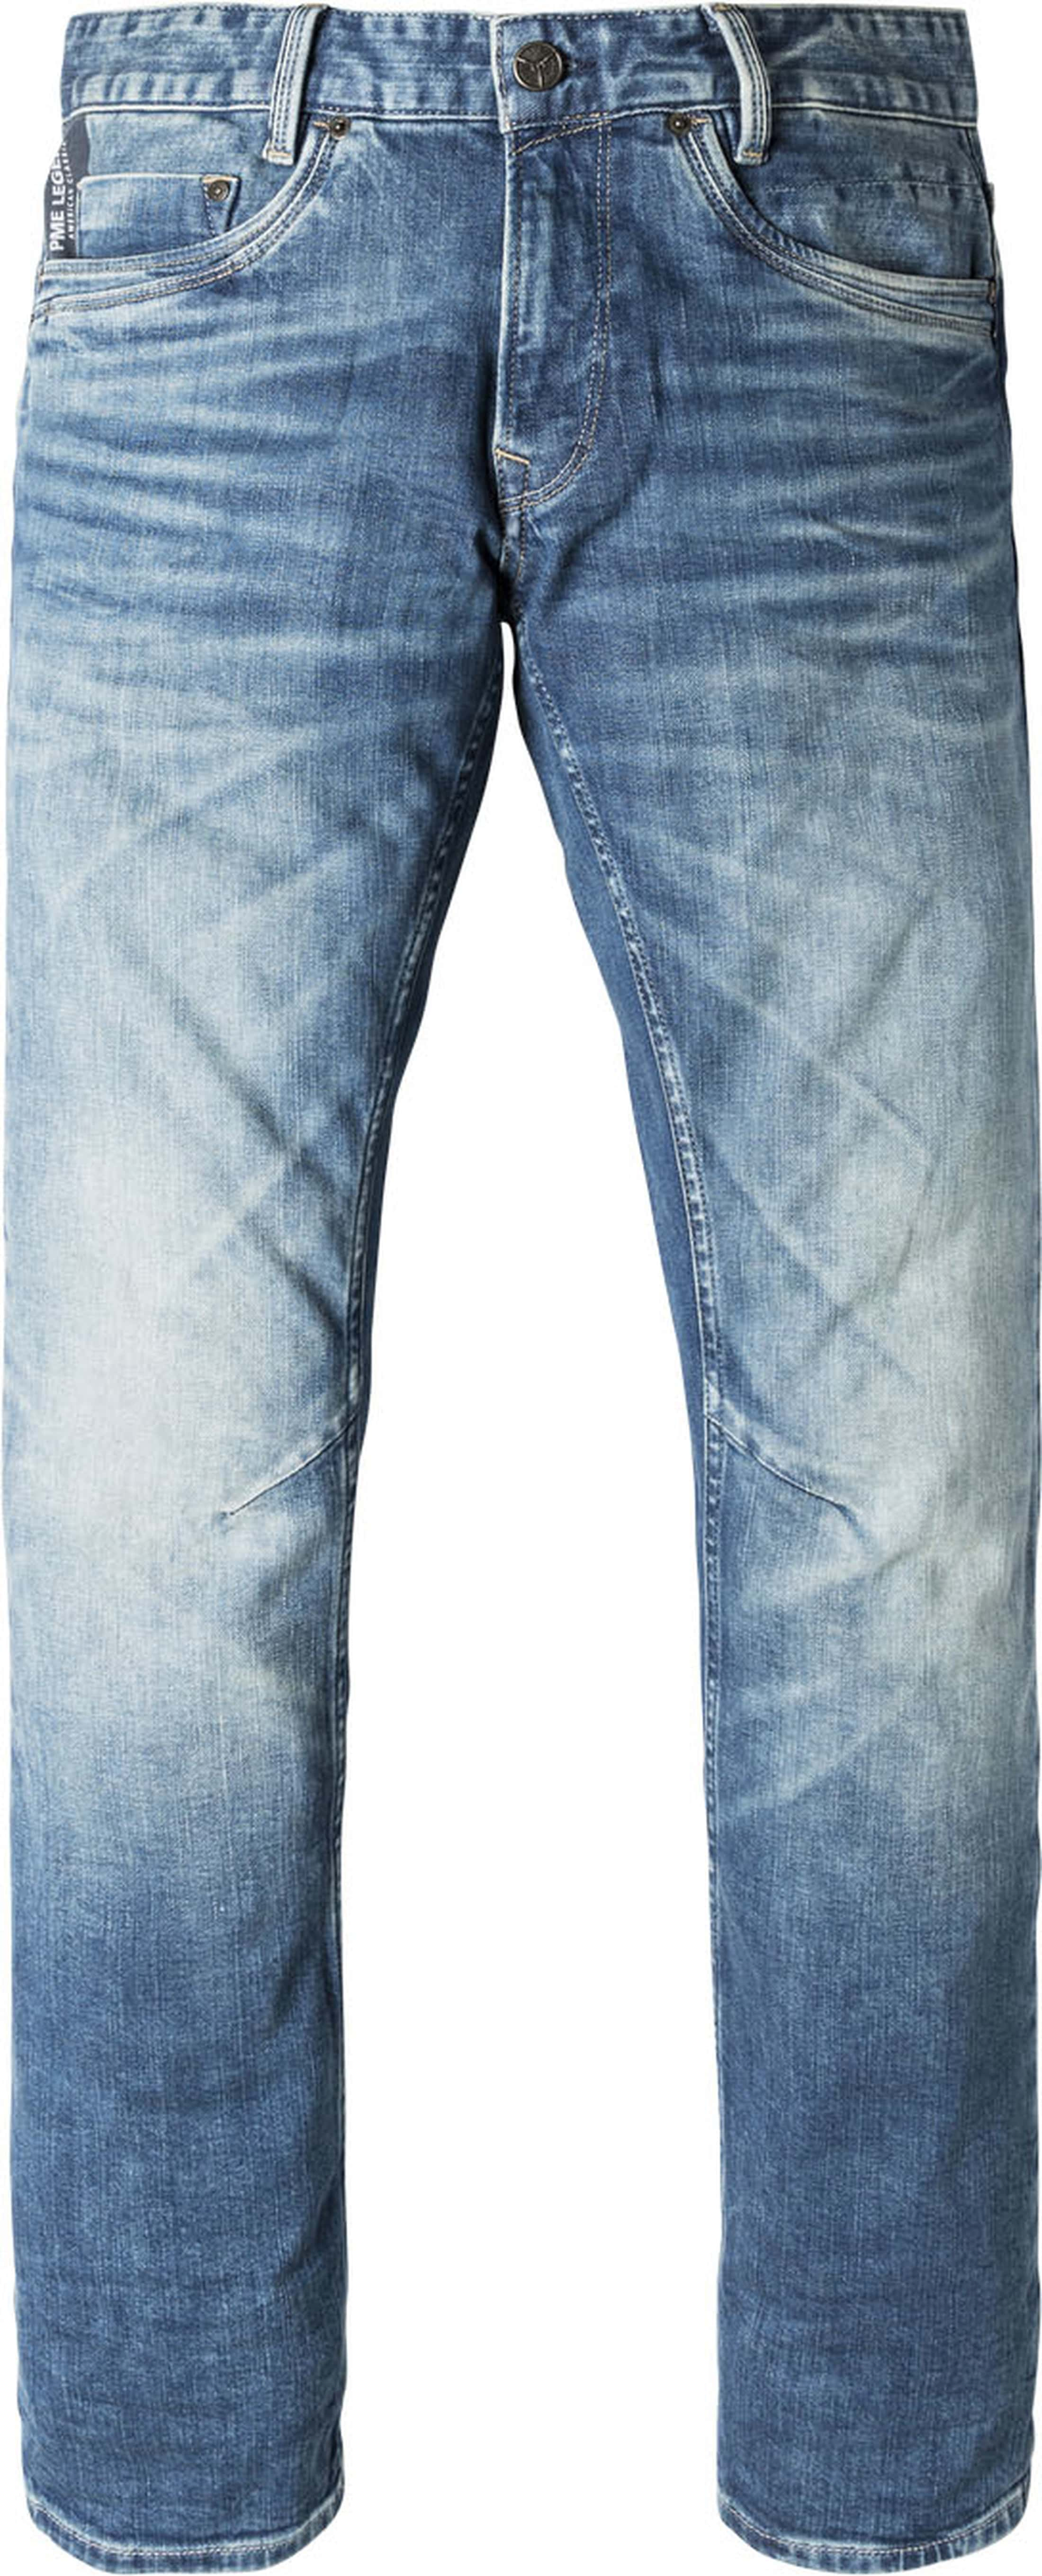 PME Legend Skymaster Jeans Blau